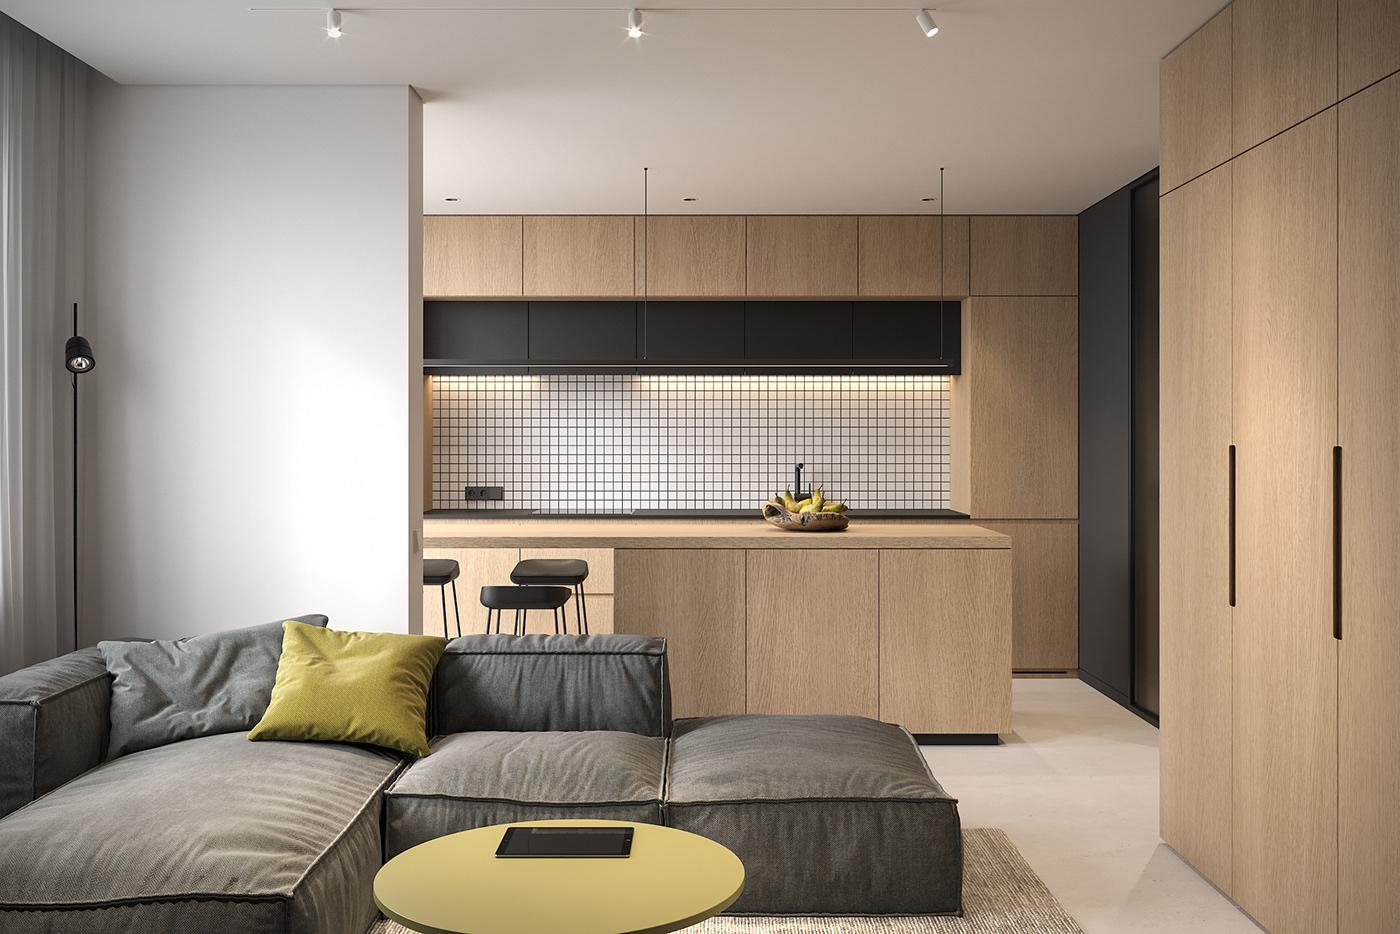 Tiny Apartment on Behance